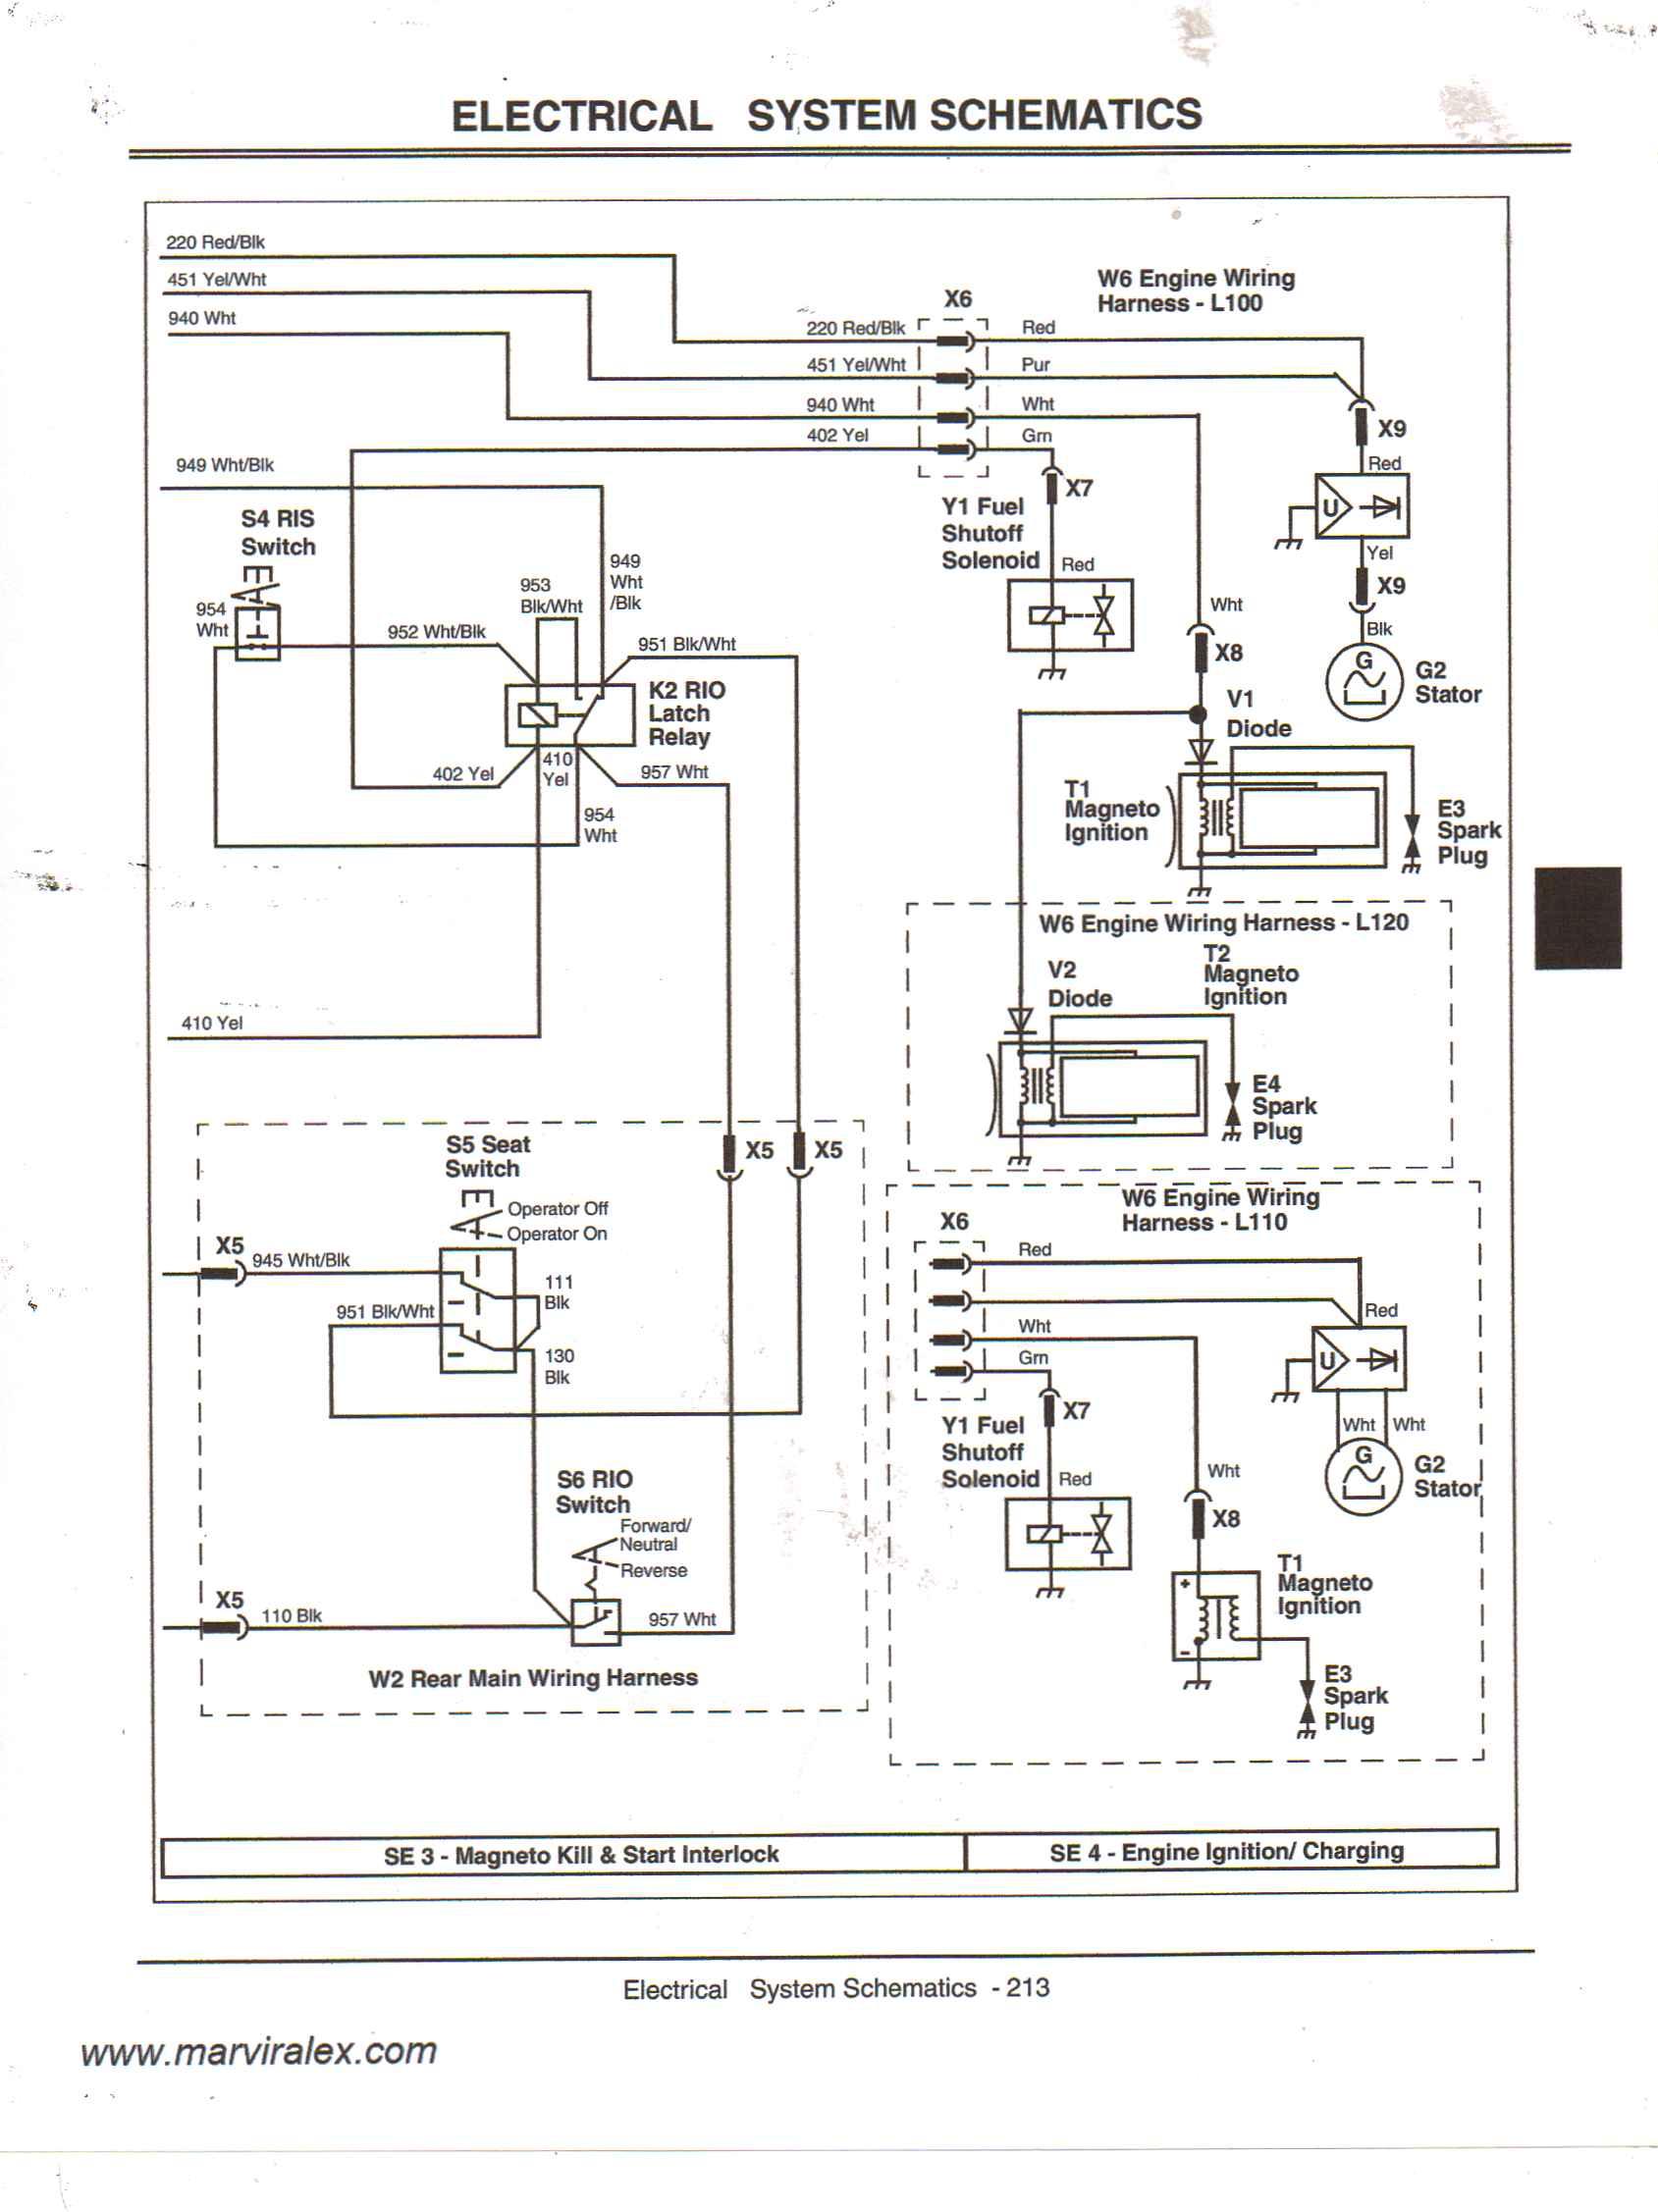 [DIAGRAM_38IS]  TG_7269] John Deere Ignition Module Moreover John Deere Gt235 Wiring  Diagram Wiring Diagram | John Deere 160 Wiring Diagram |  | Ricis Egre Mohammedshrine Librar Wiring 101